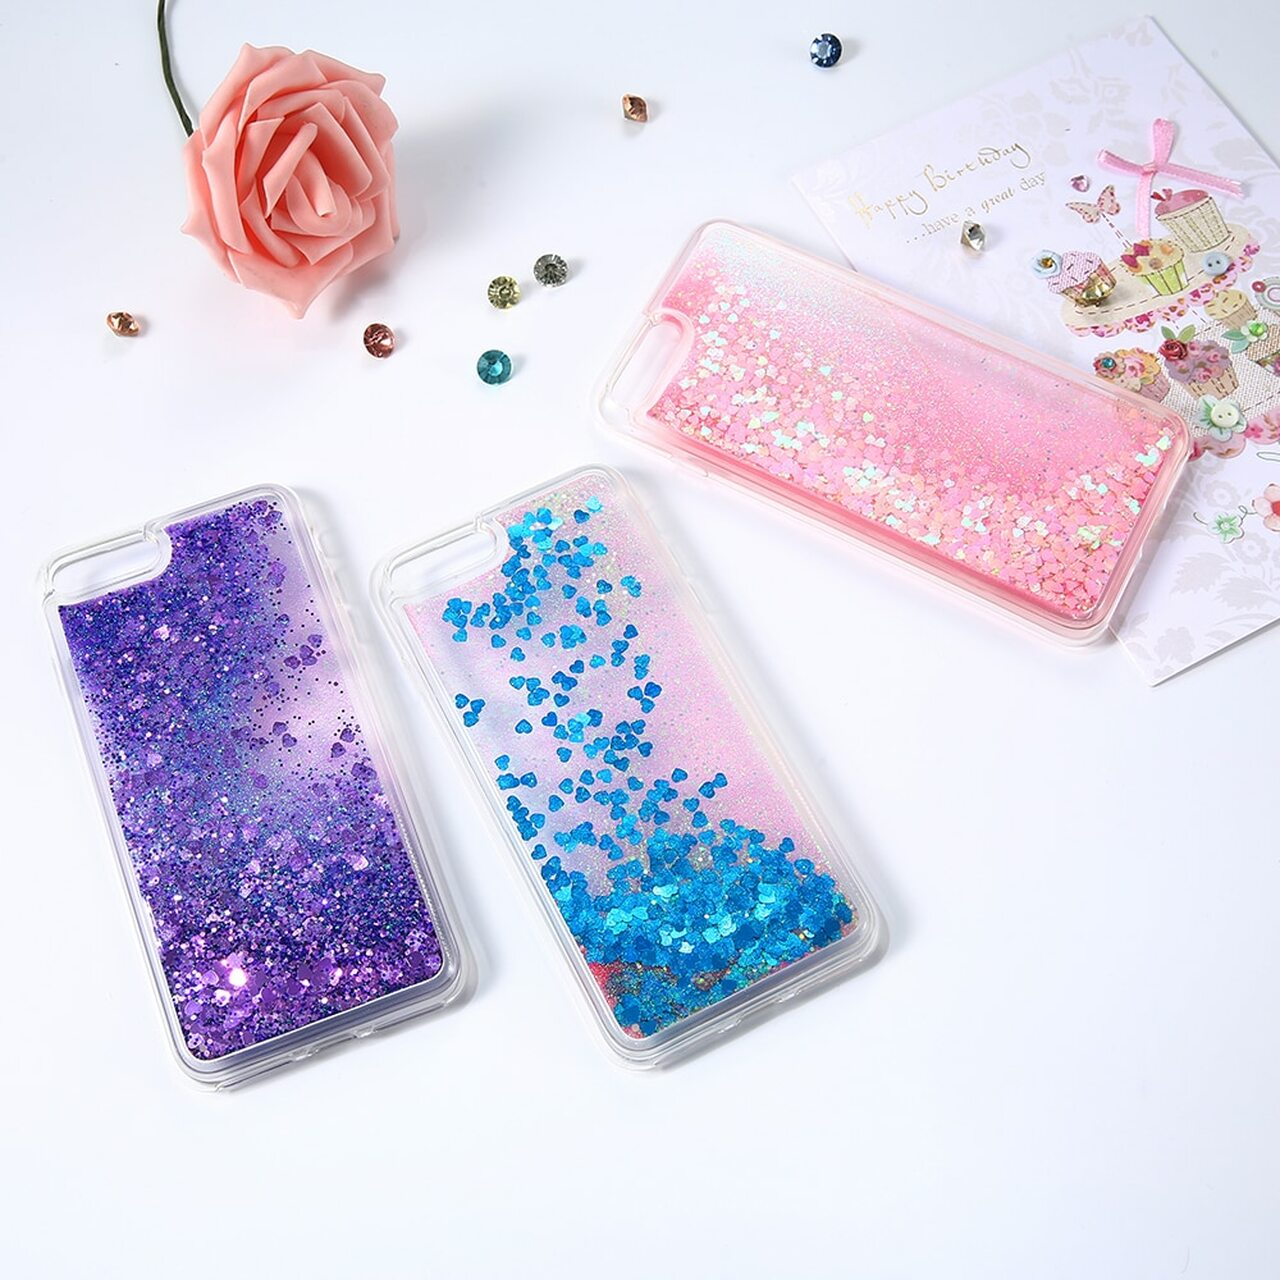 ... Bling Liquid Quicksand Phone Case For iPhone XS Max XR X 8 7 Plus Shiny  Sequin ... 692e7b5e0271